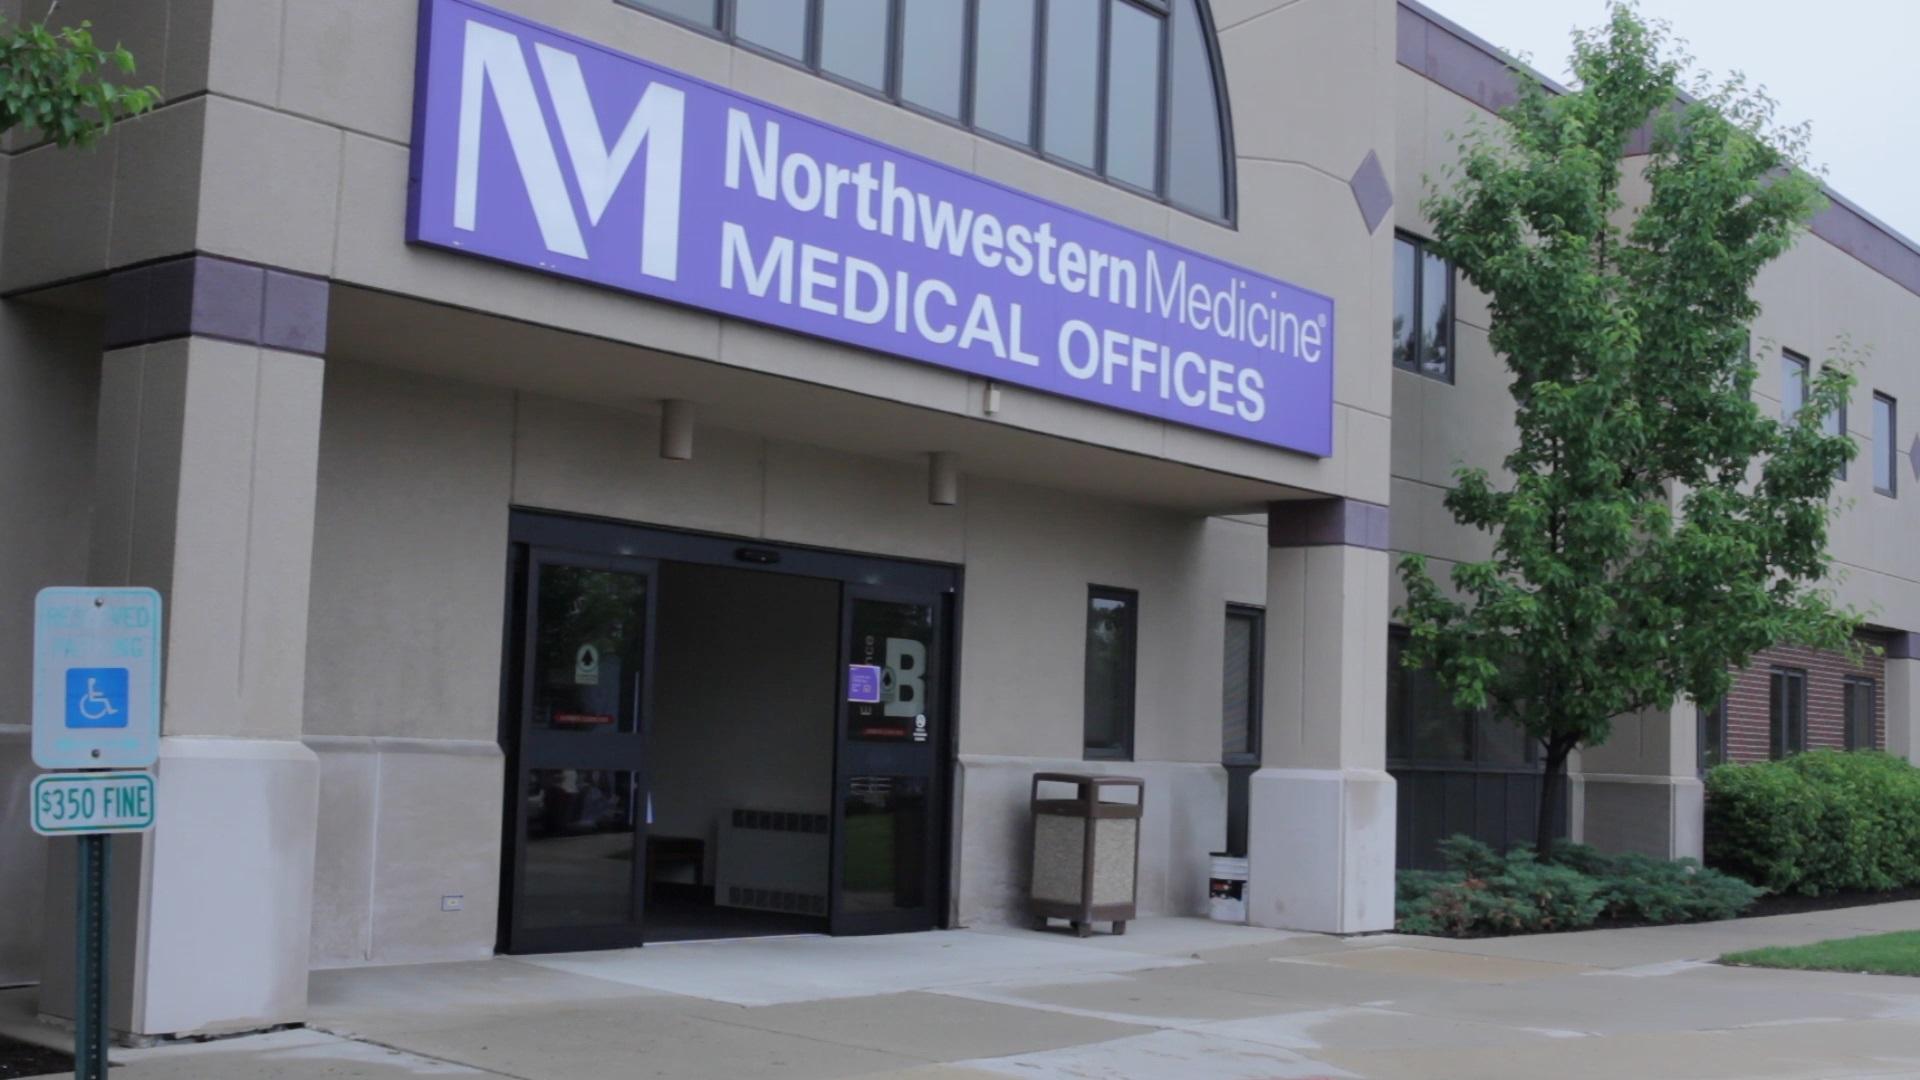 Dr. Scott J. Kolbaba's Medical Office